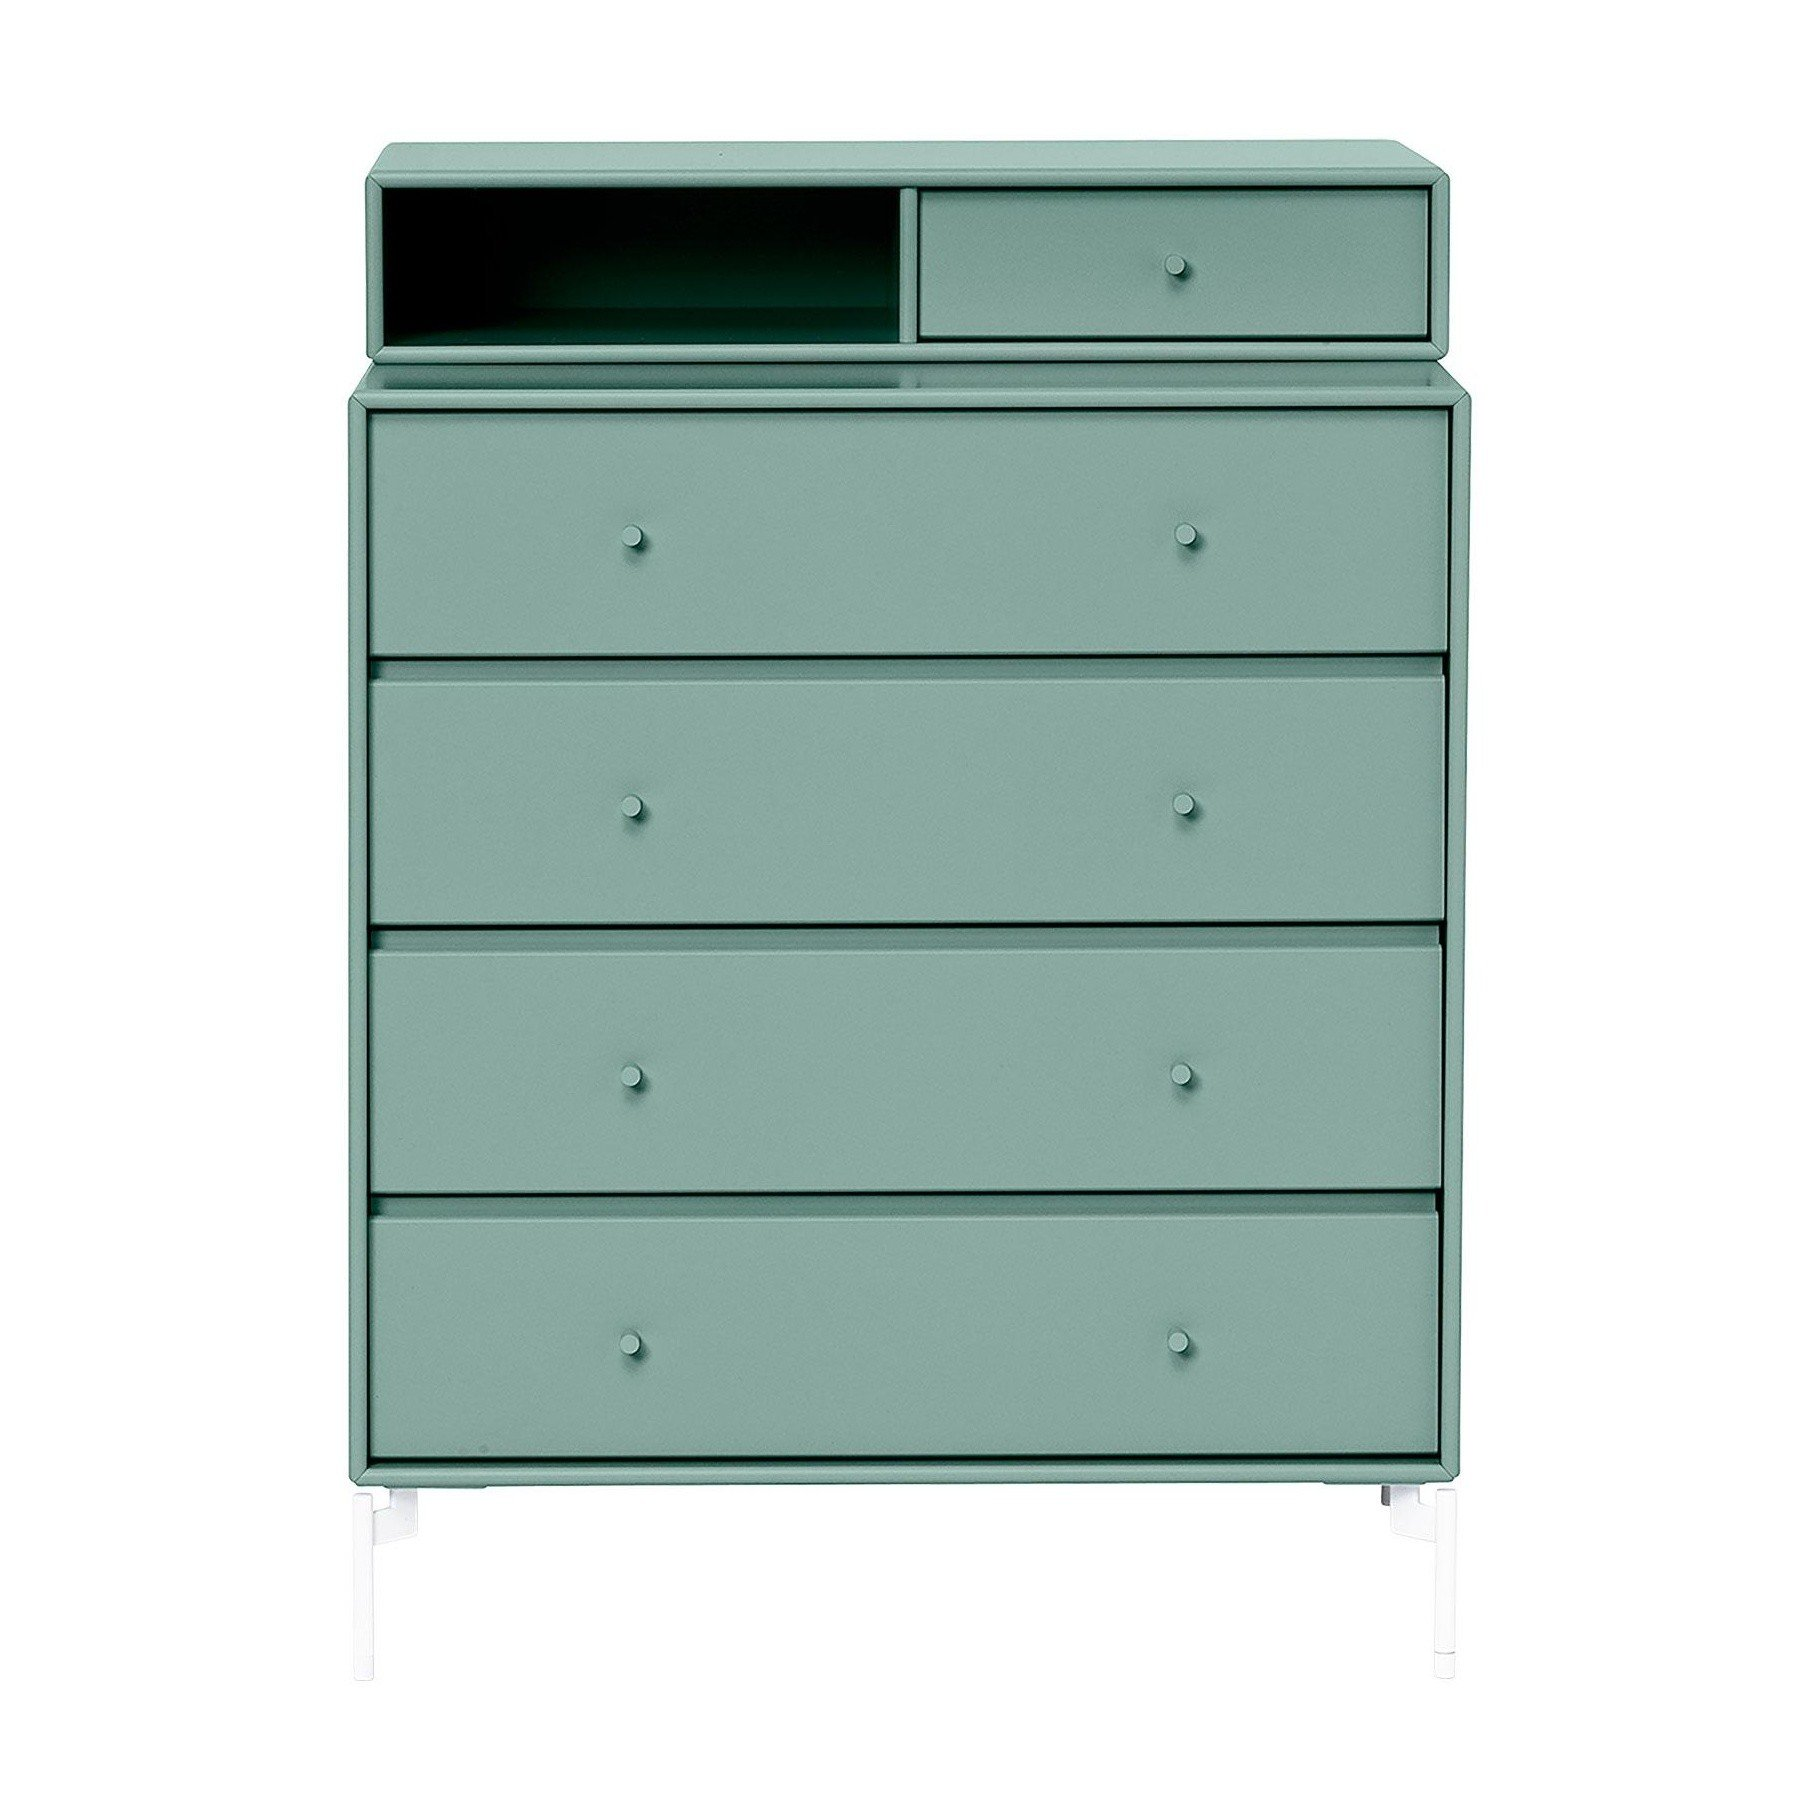 keep kommode 94 8x 69 6x46 8cm montana. Black Bedroom Furniture Sets. Home Design Ideas